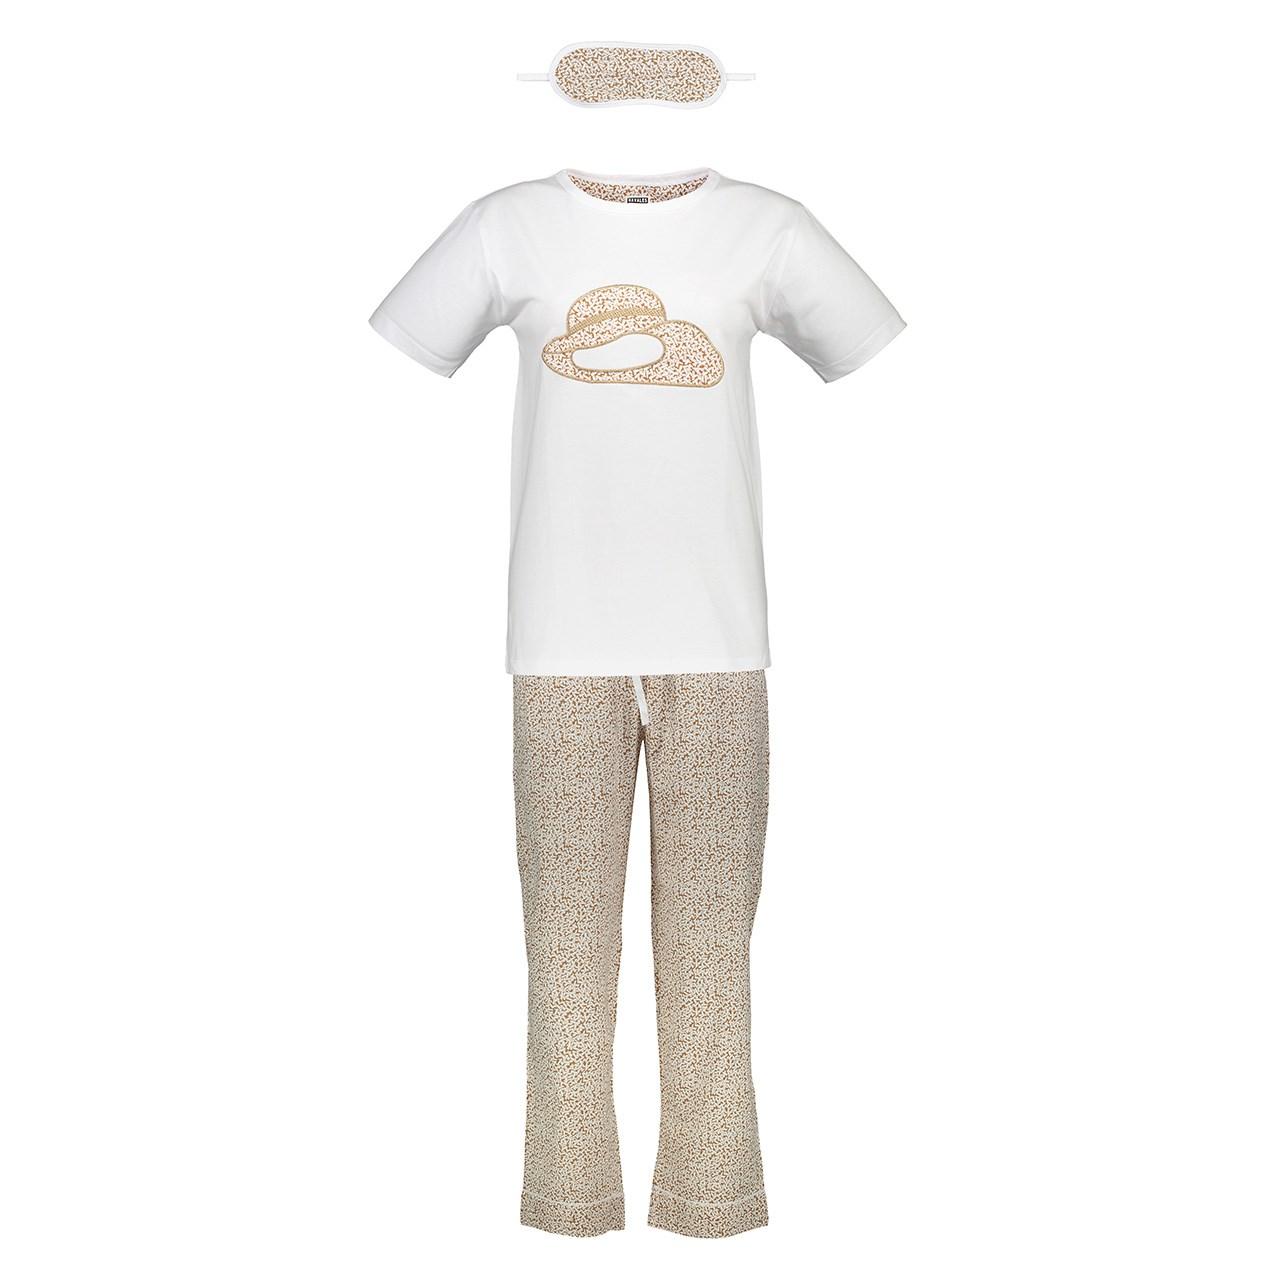 ست تی شرت و شلوار زنانه ناوالس کدSET01BW